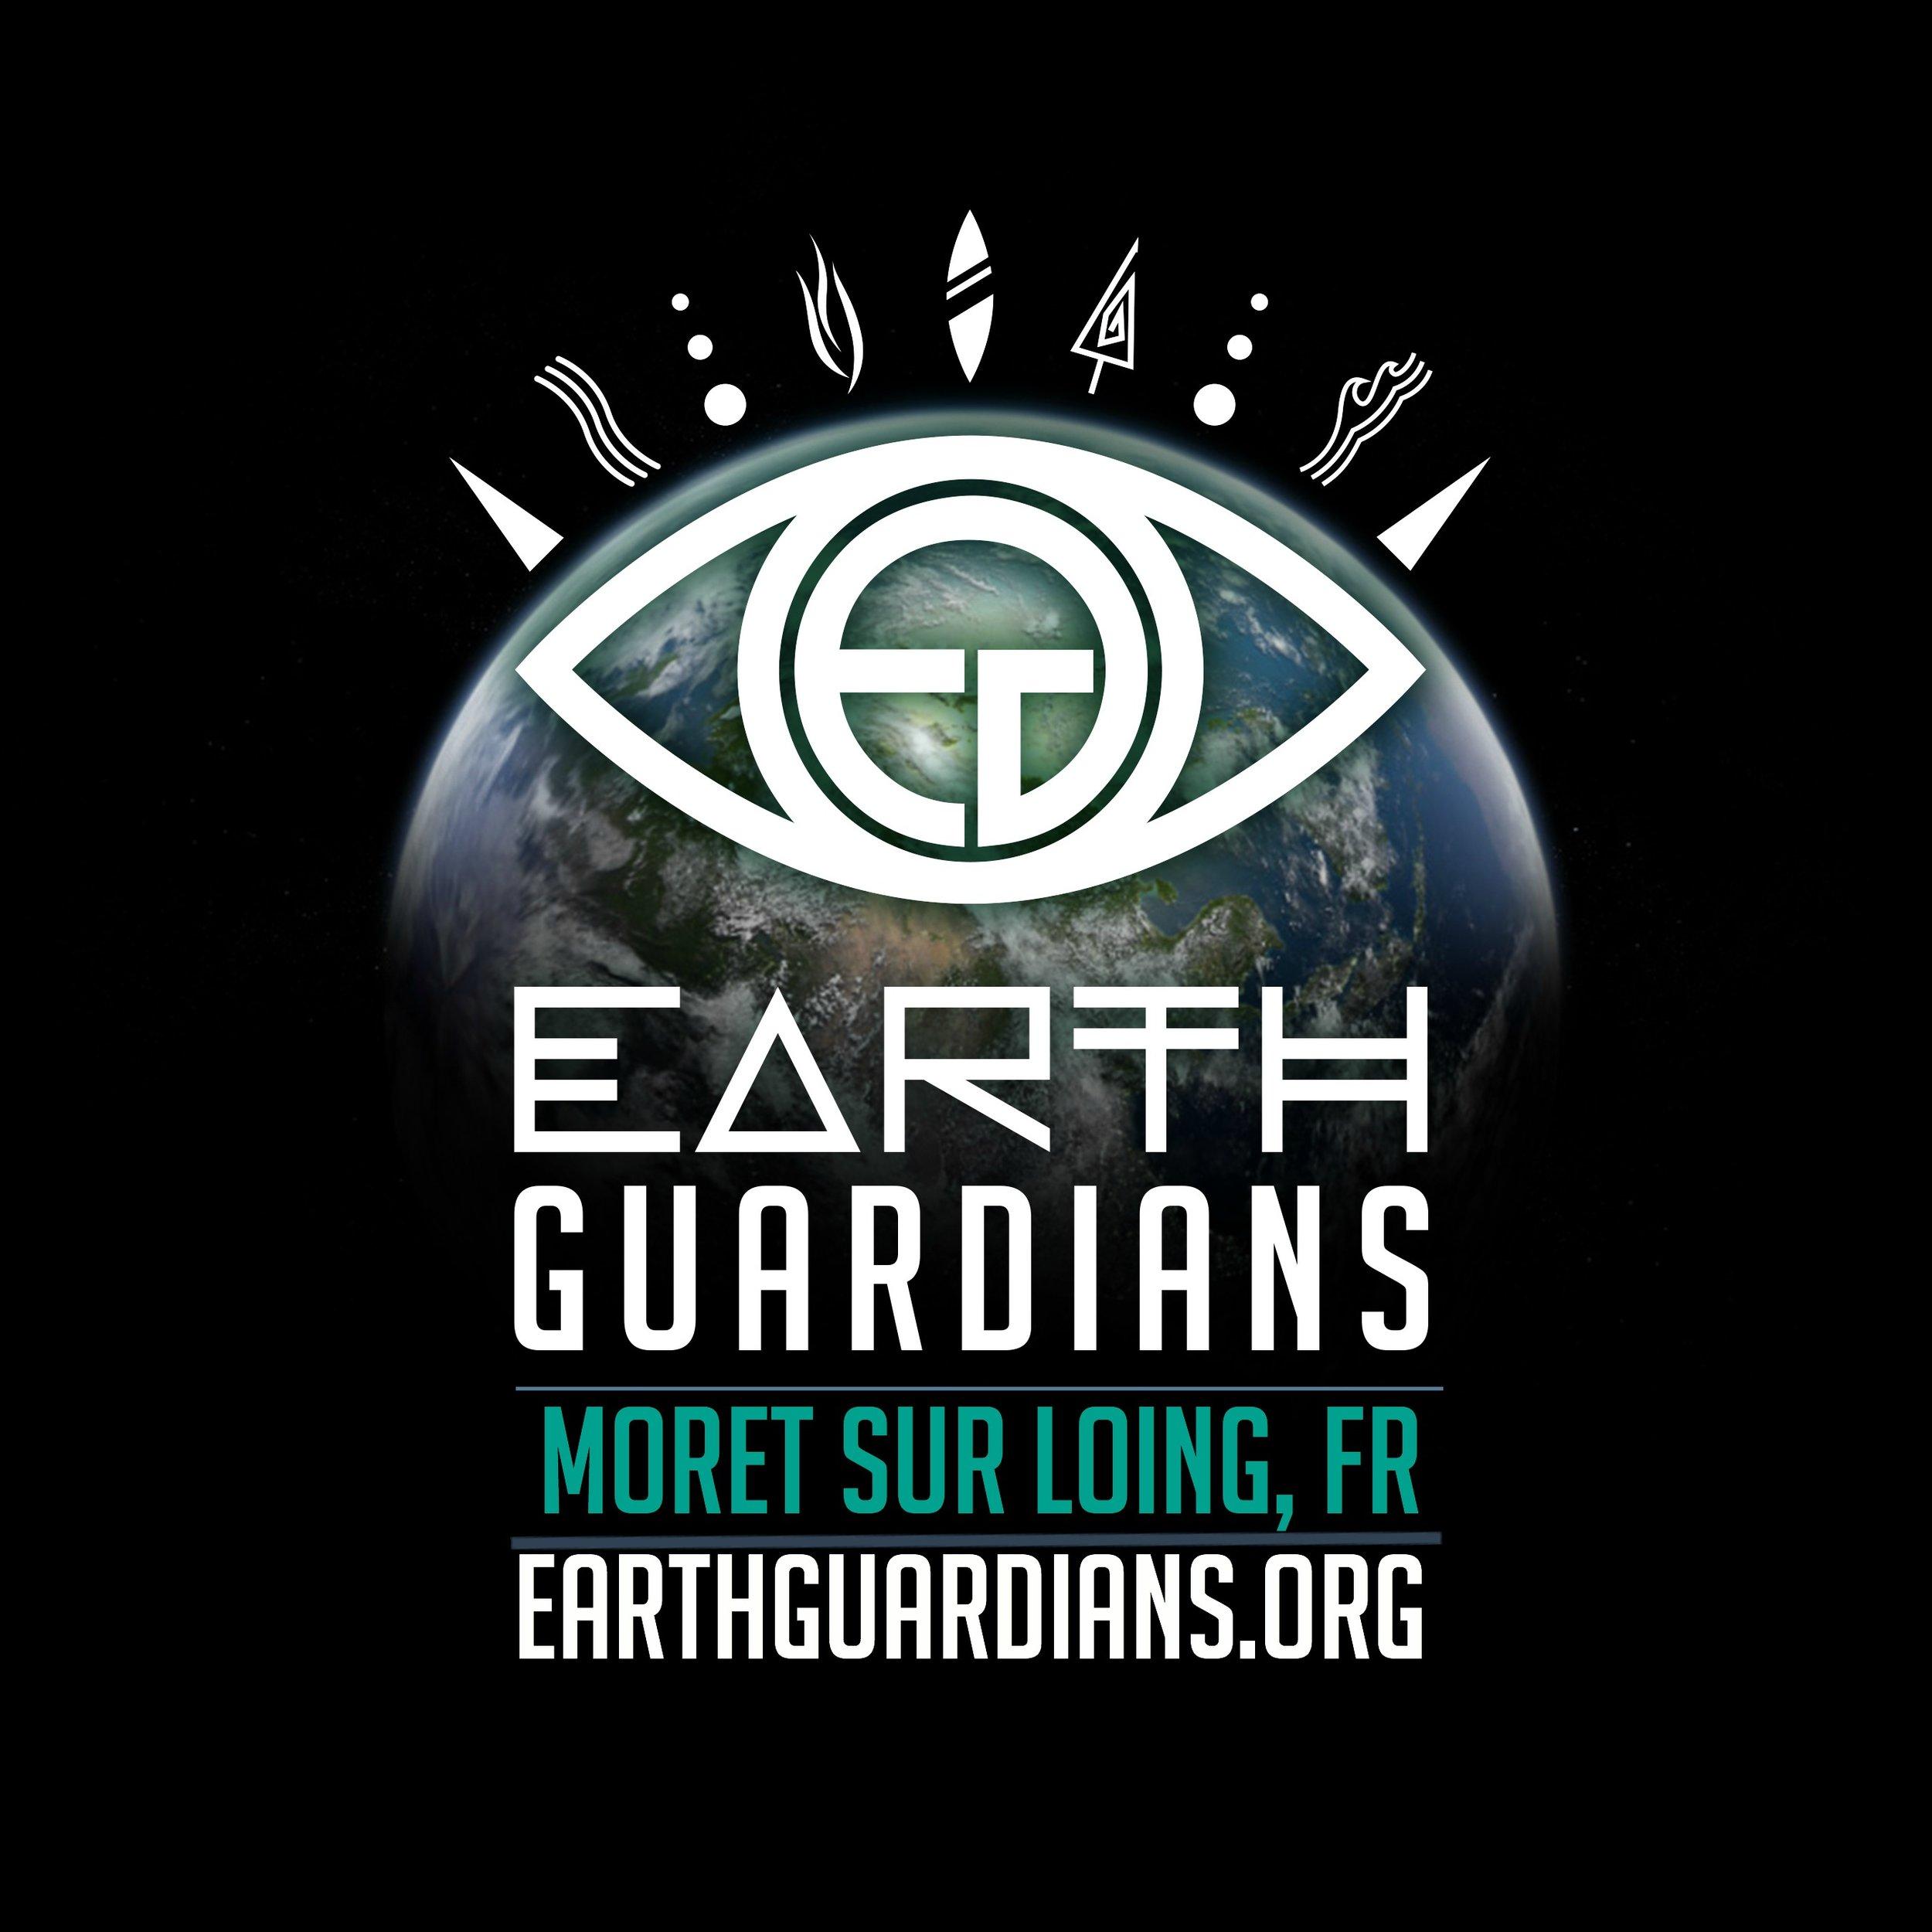 EG_crew logo FRANCia-2.jpg